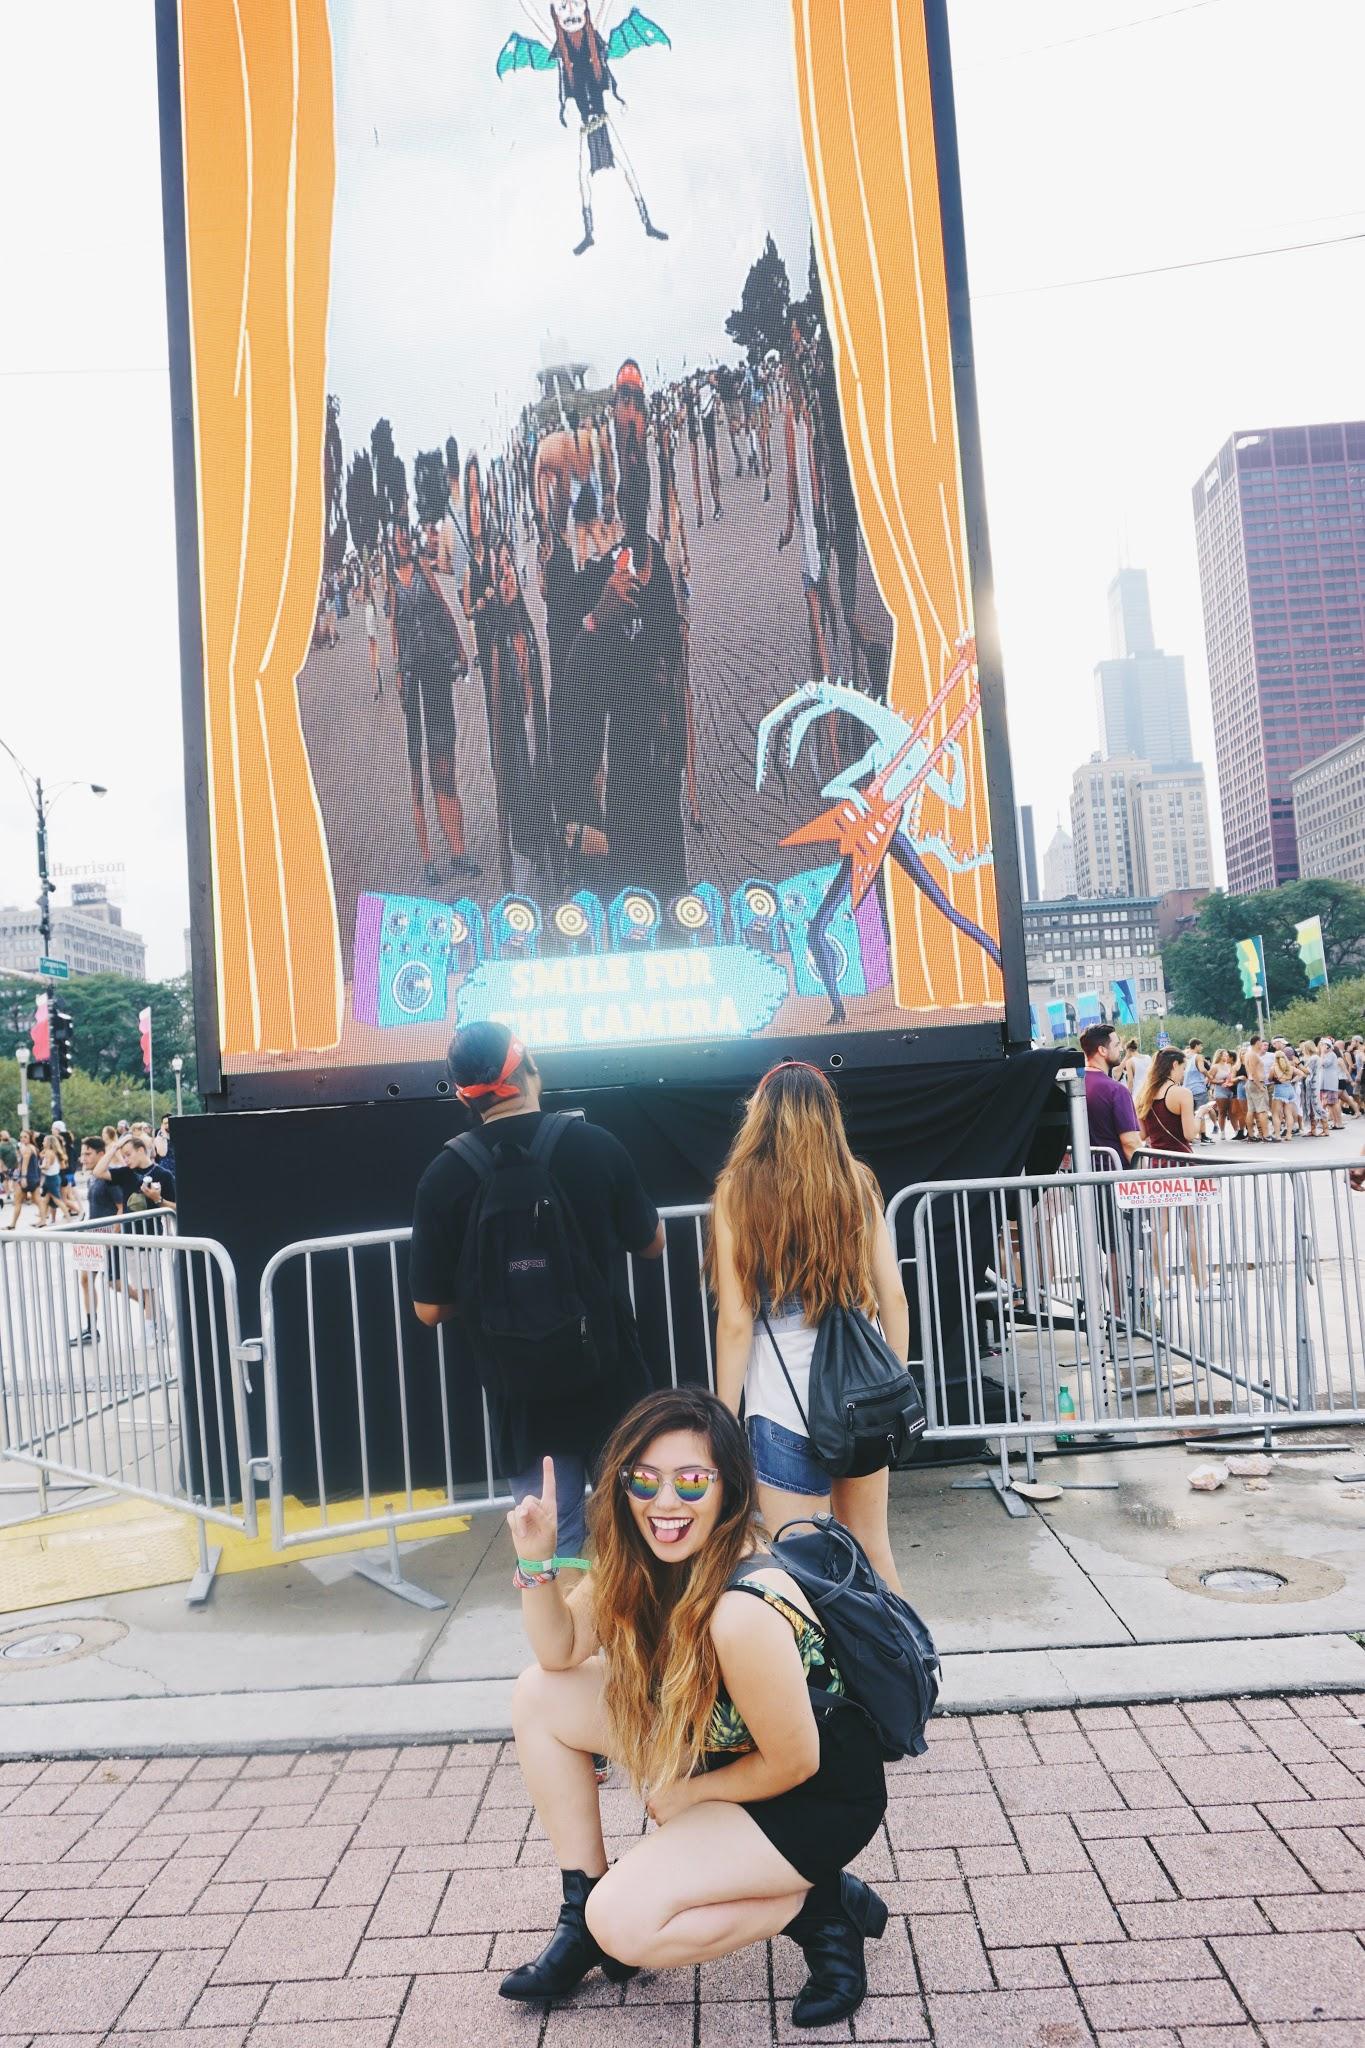 chicago lollapalooza 2016 day 1